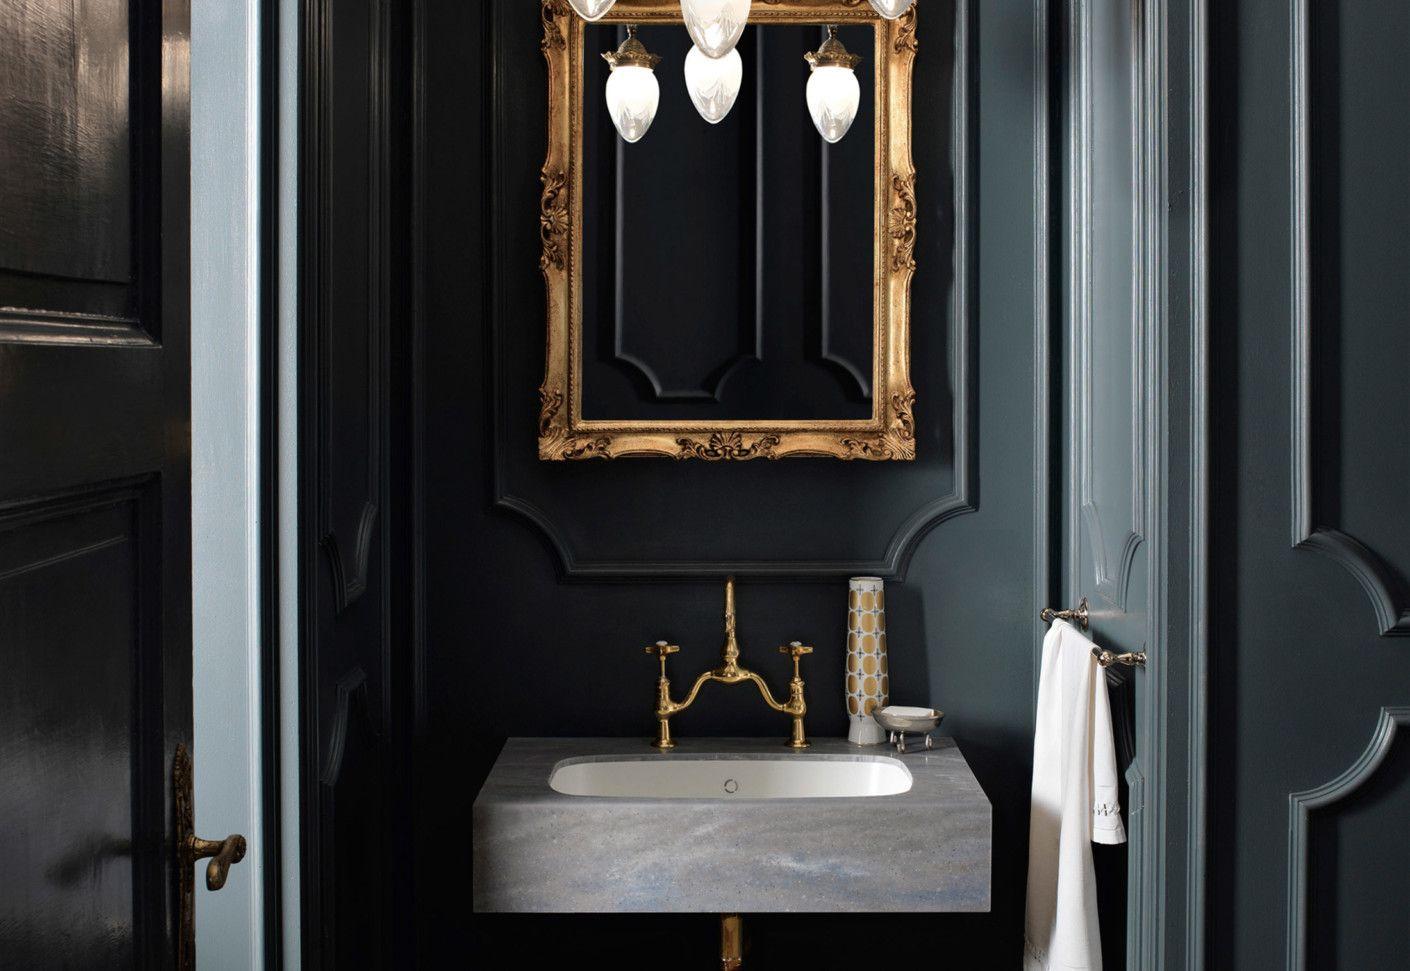 Luxurious bathroom interior in French style   Interior Design ... on white bathroom mirror, gold bathroom mirror, orange bathroom mirror, leather bathroom mirror, trim bathroom mirror, shabby chic bathroom mirror, aqua bathroom mirror, hollywood regency bathroom mirror, large bathroom mirror, vogue bathroom mirror, french toilet, fun bathroom mirror, retro bathroom mirror, pink bathroom mirror, french style floor mirror, decorating bathroom mirror, blonde bathroom mirror, victorian bathroom mirror, mirror bathroom mirror, glass bathroom mirror,